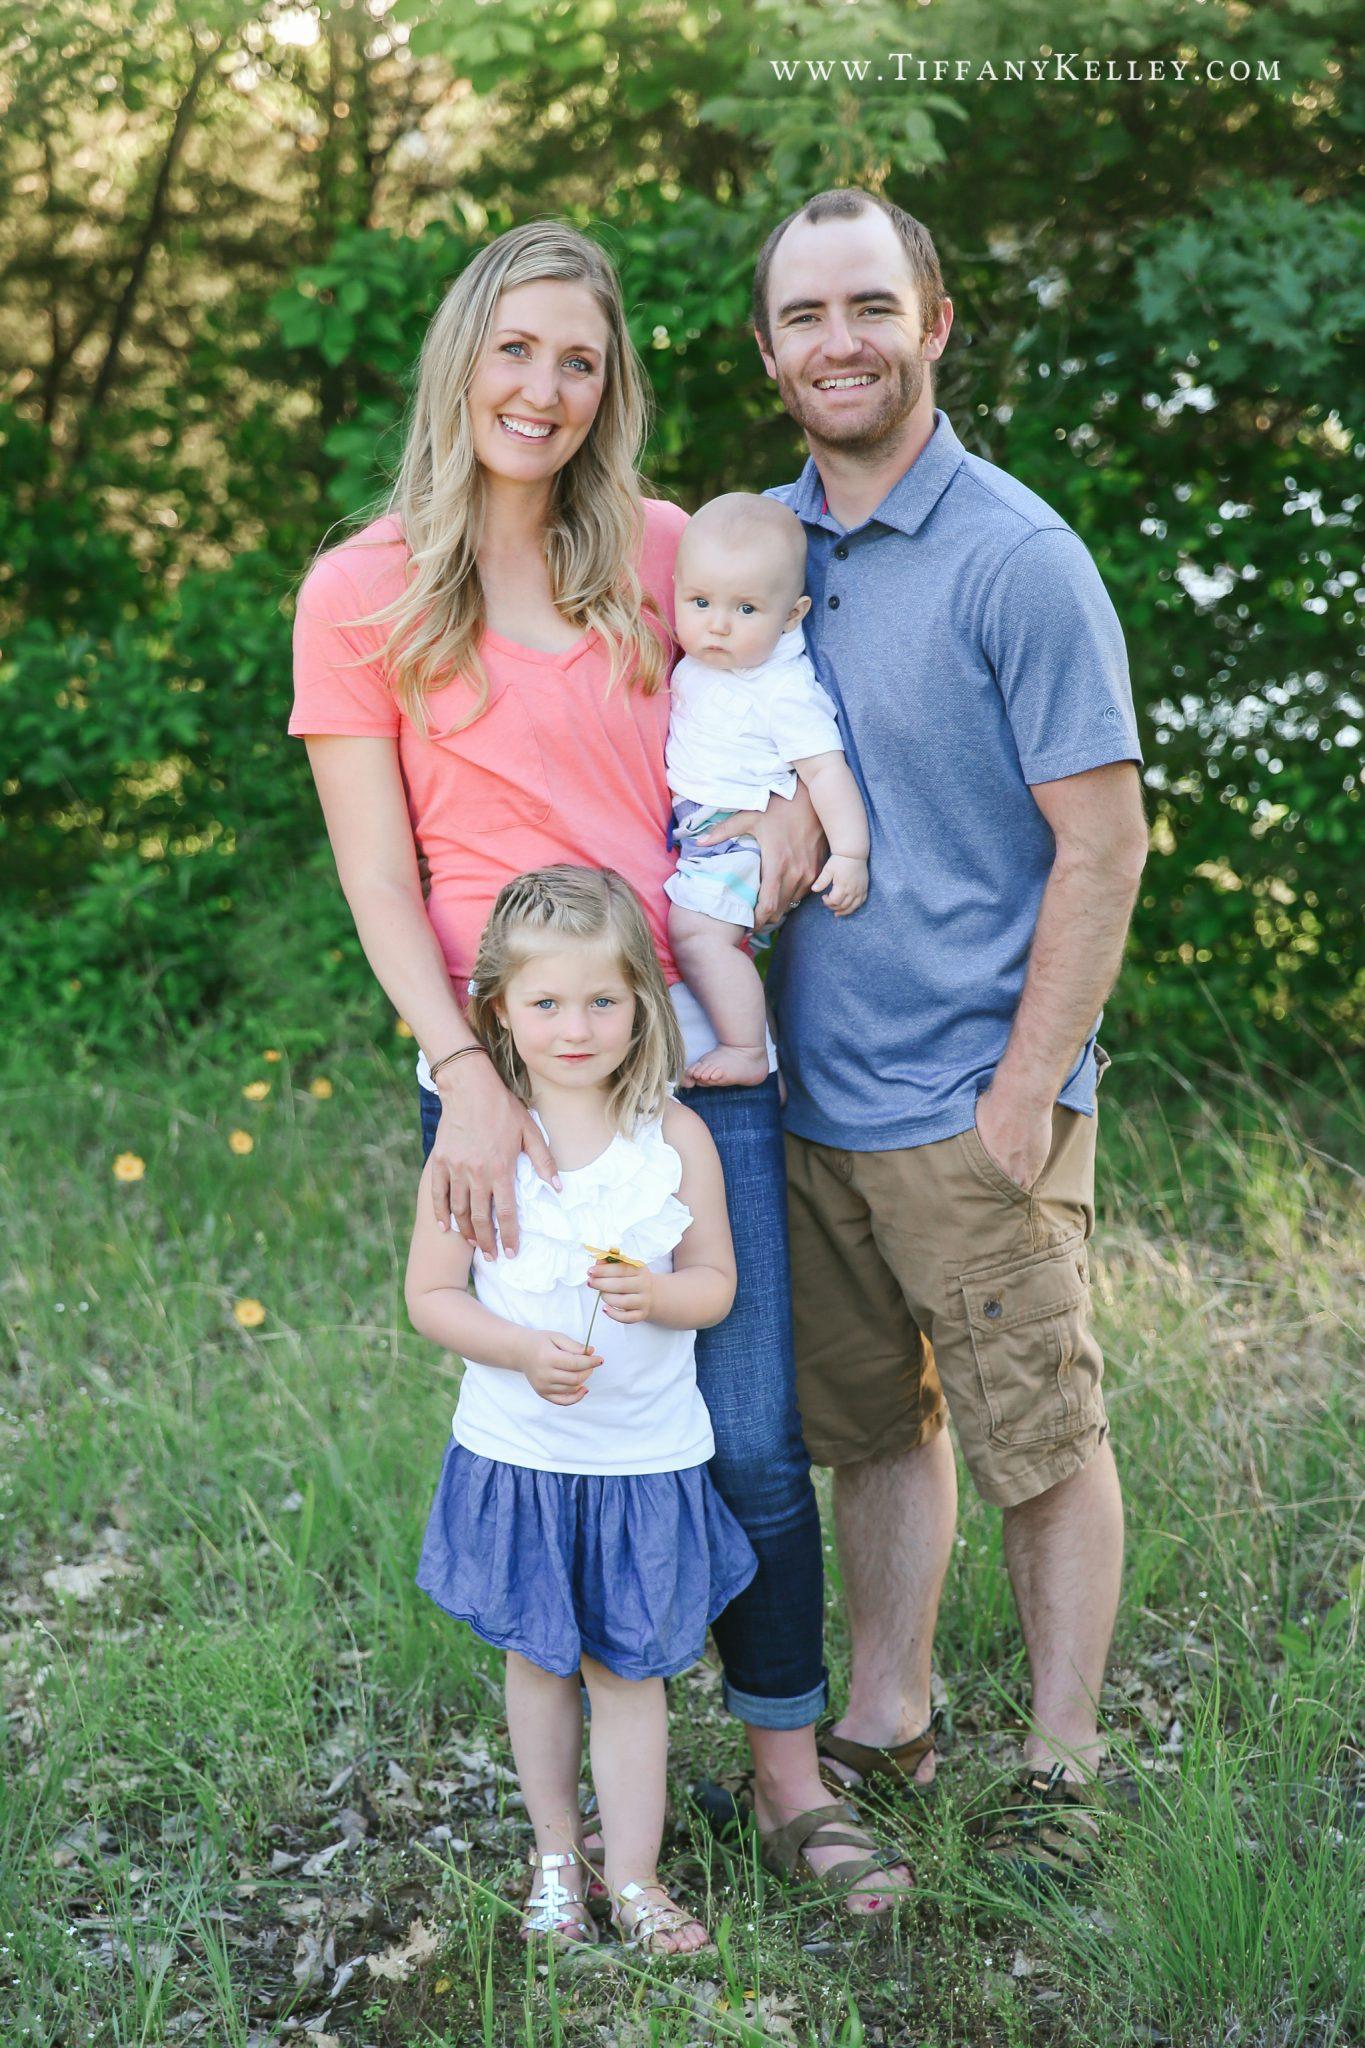 Cole Stillwaters Resort Branson MO Family Photographer Tiffany Kelley Photography